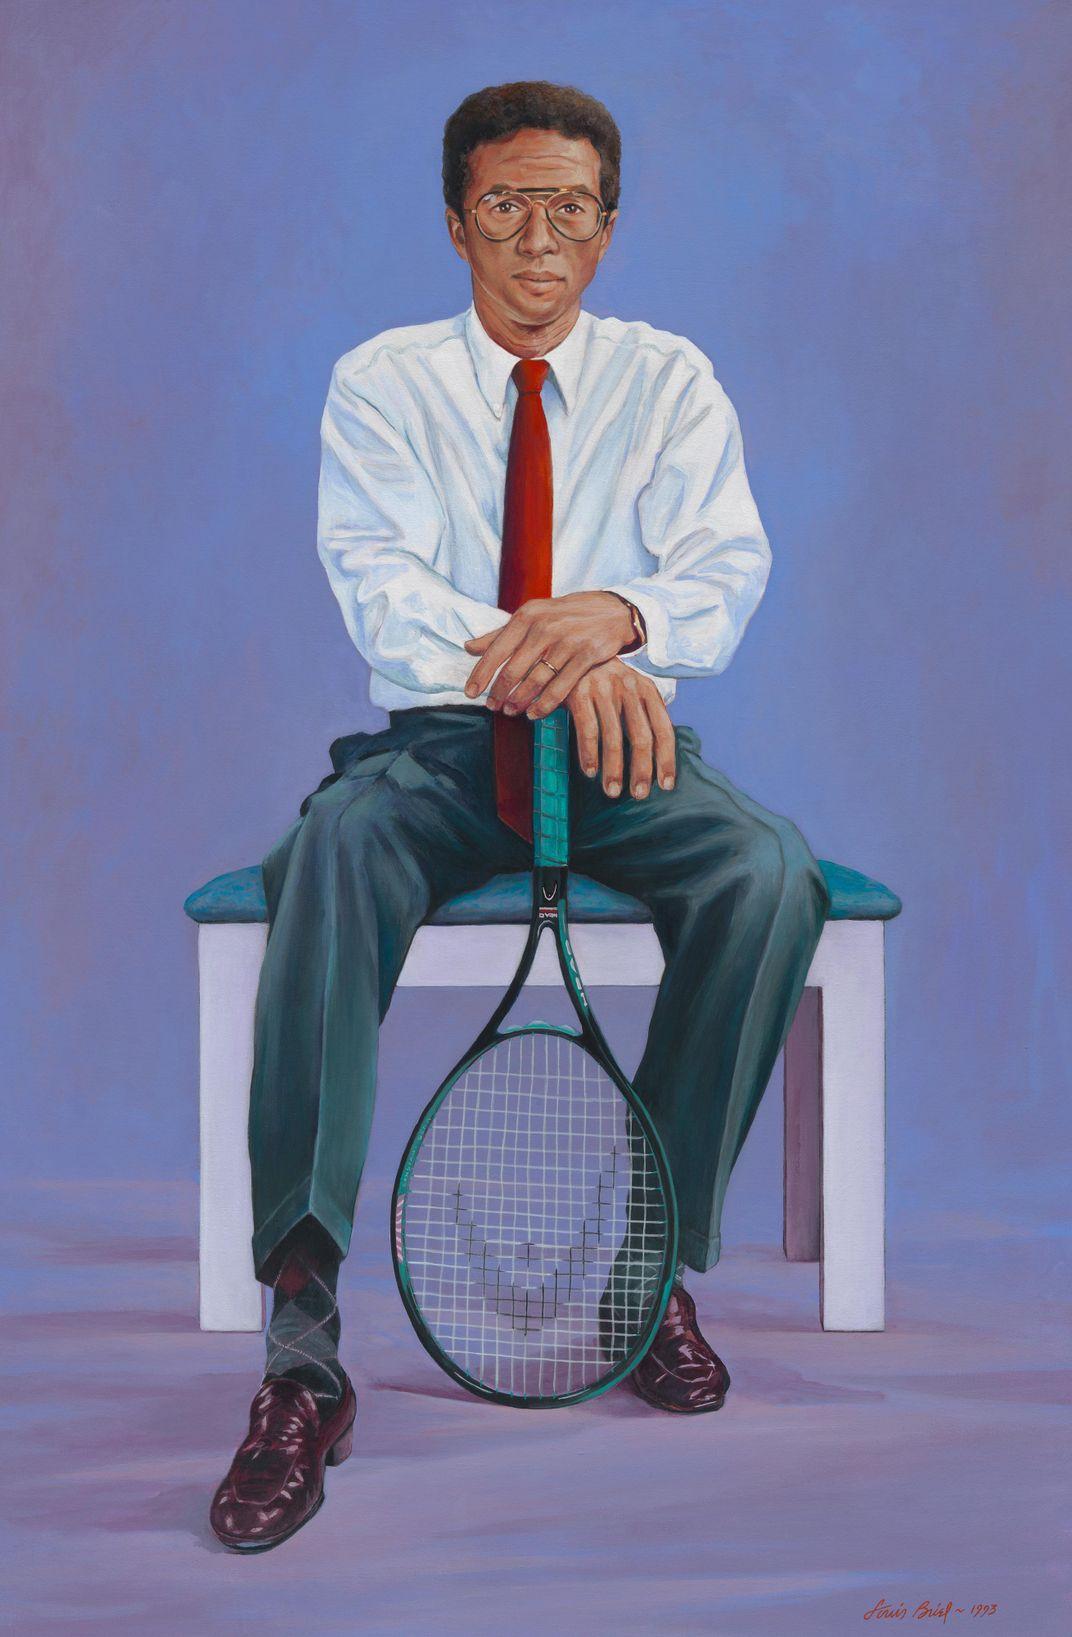 How Arthur Ashe Made Tennis History